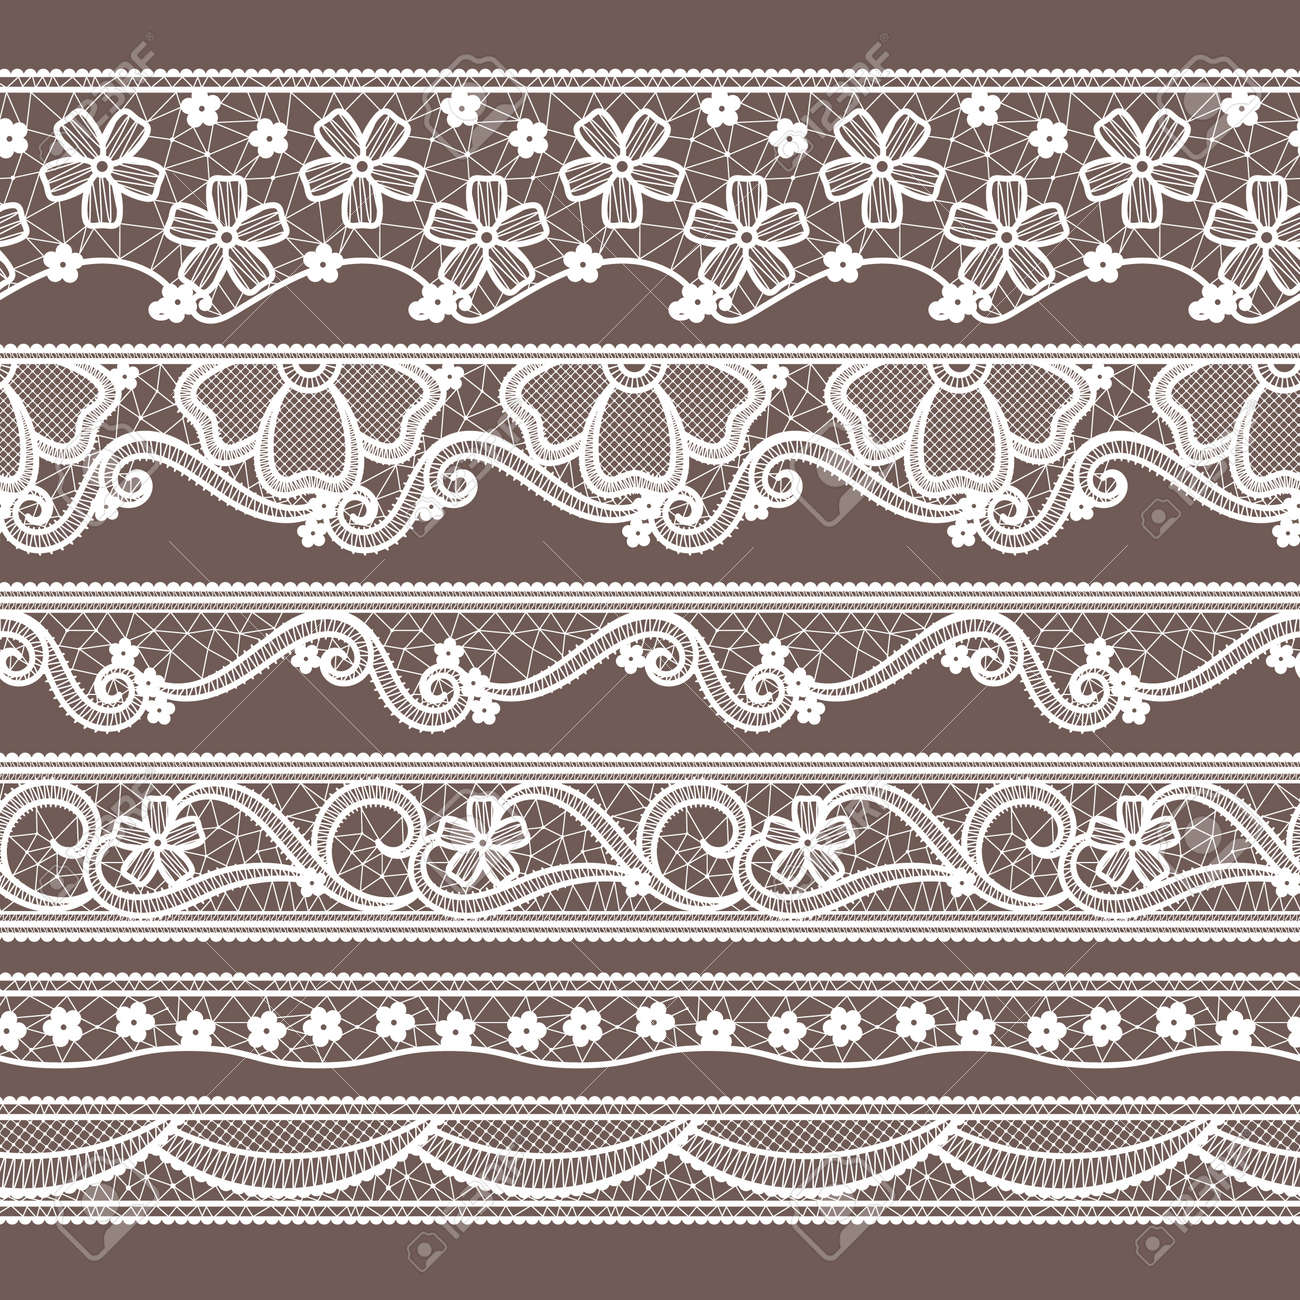 Set of six lace ribbons horizontal seamless patterns. Vector needlework illustrations. Lace pattern decoration textile - 166037033